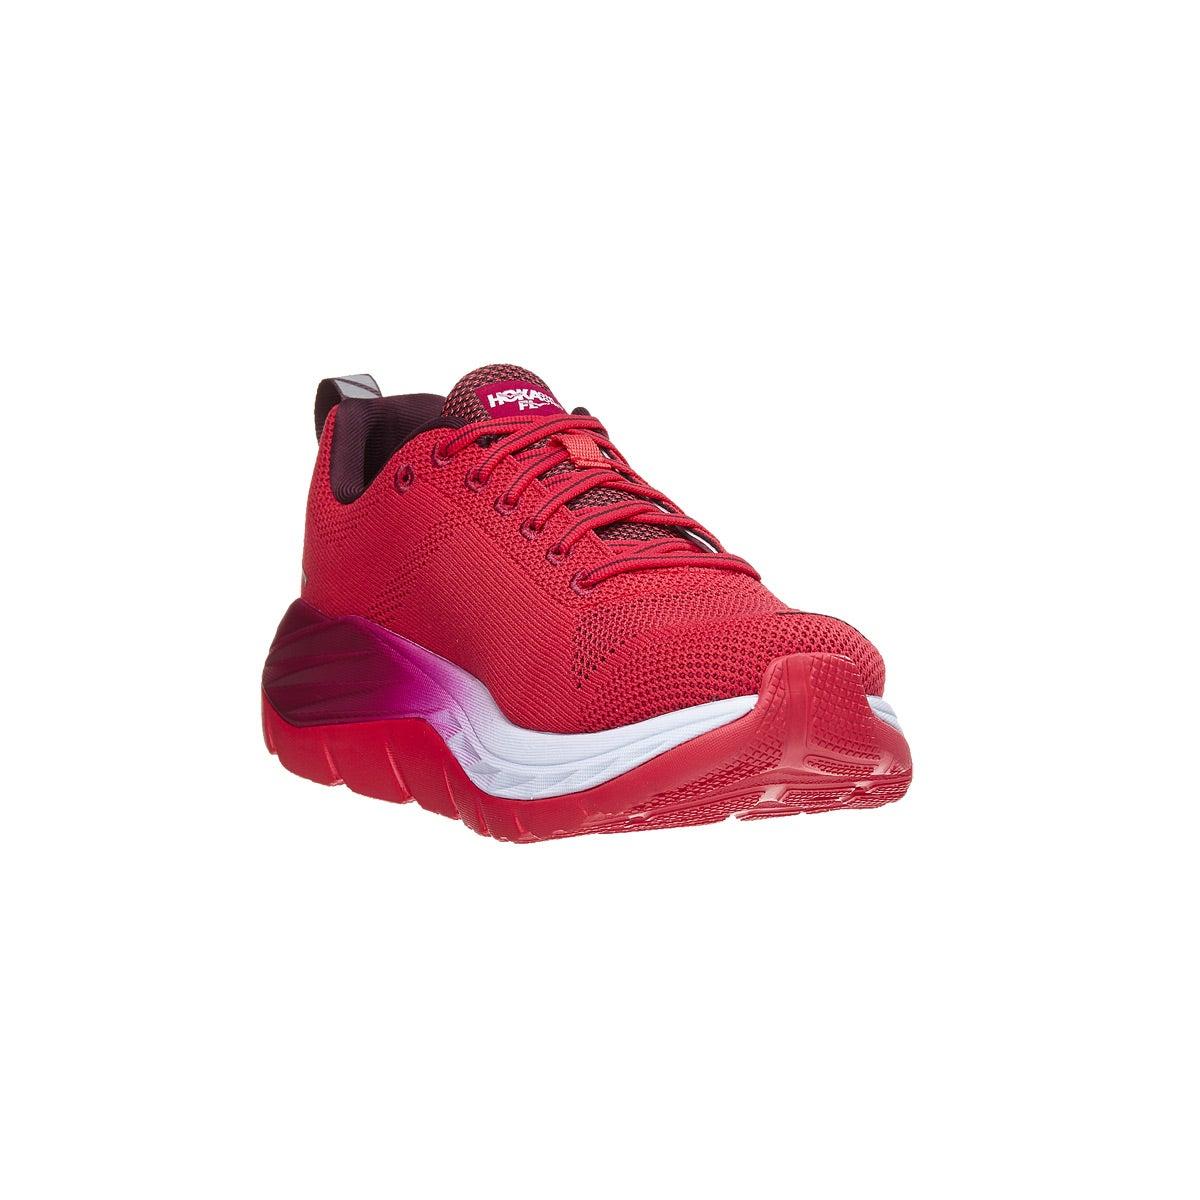 86664b097fad ... HOKA ONE ONE Mach Womens Shoes HibiscusCherries 360° View Running  Warehouse. pretty cool 29b40 ...